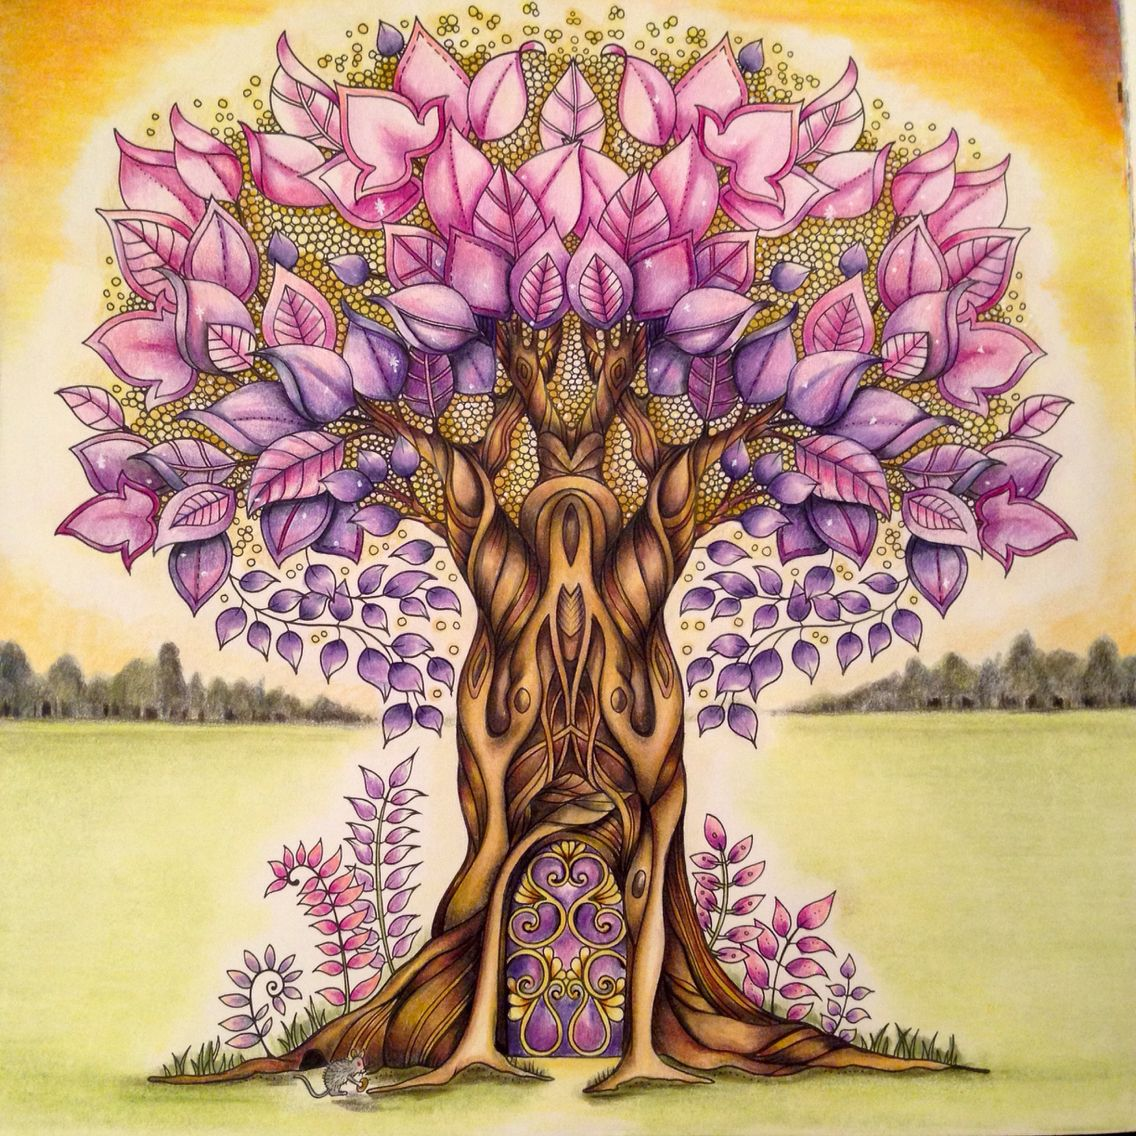 Enchanted Forest Johanna Basford I Used Polychromos Pencils